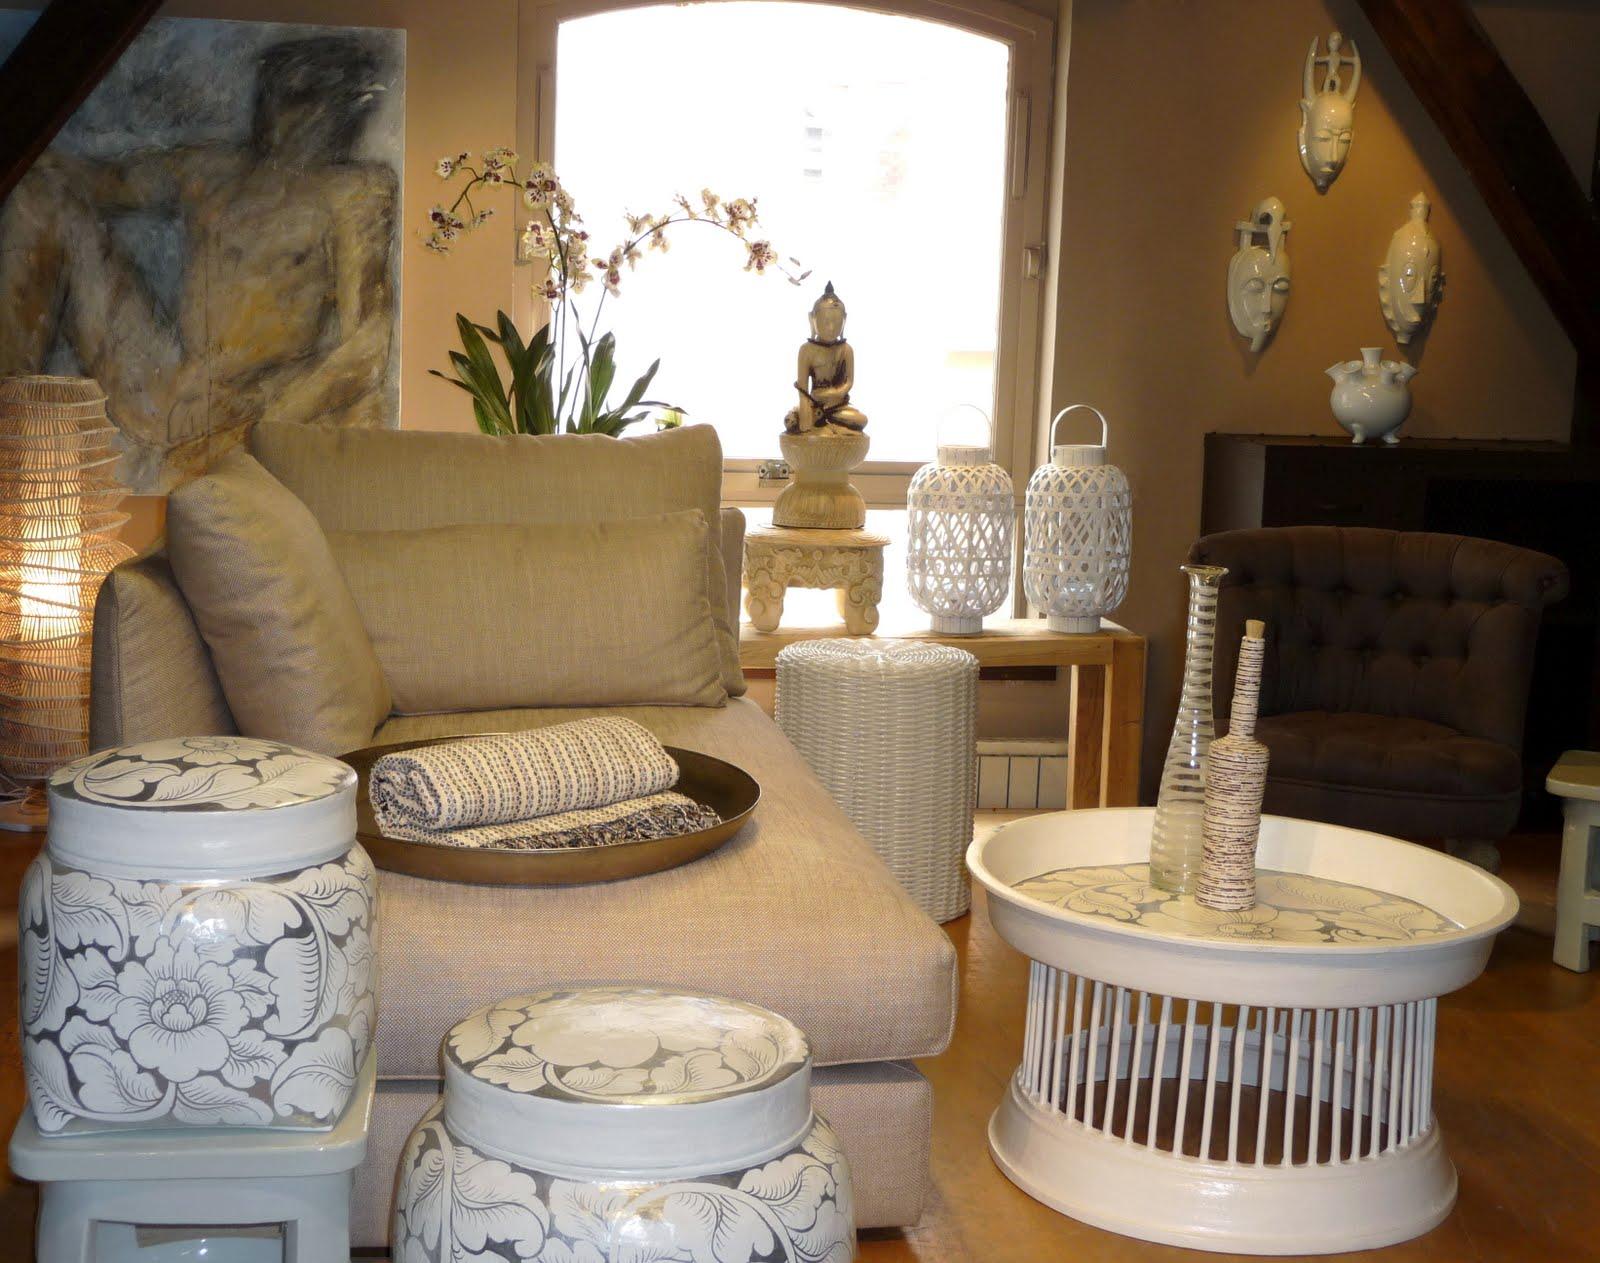 jean dange quiet atmosphere paisible atmosph re. Black Bedroom Furniture Sets. Home Design Ideas